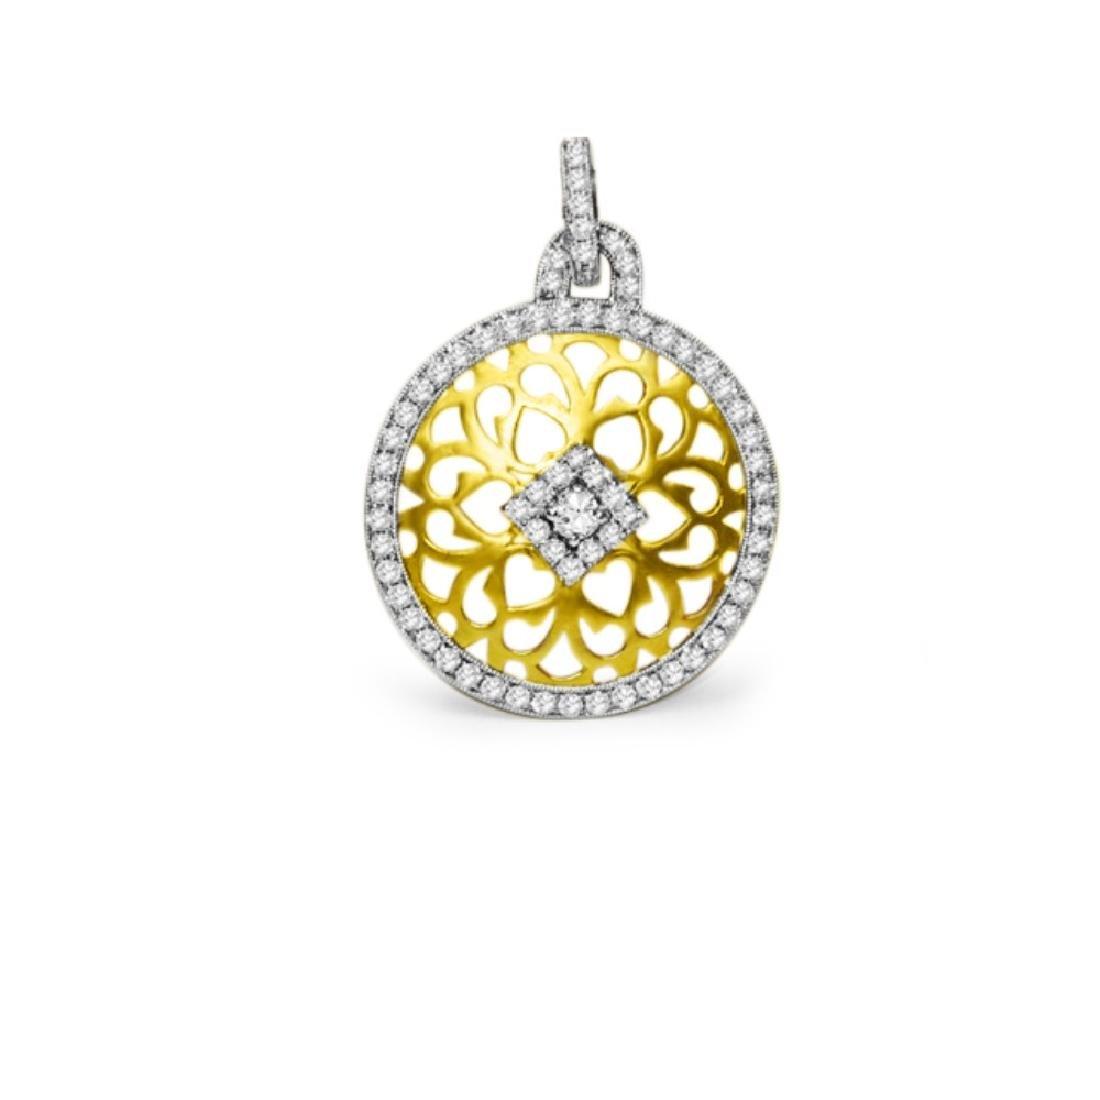 18K YELLOW GOLD & DIAMOND Pendant